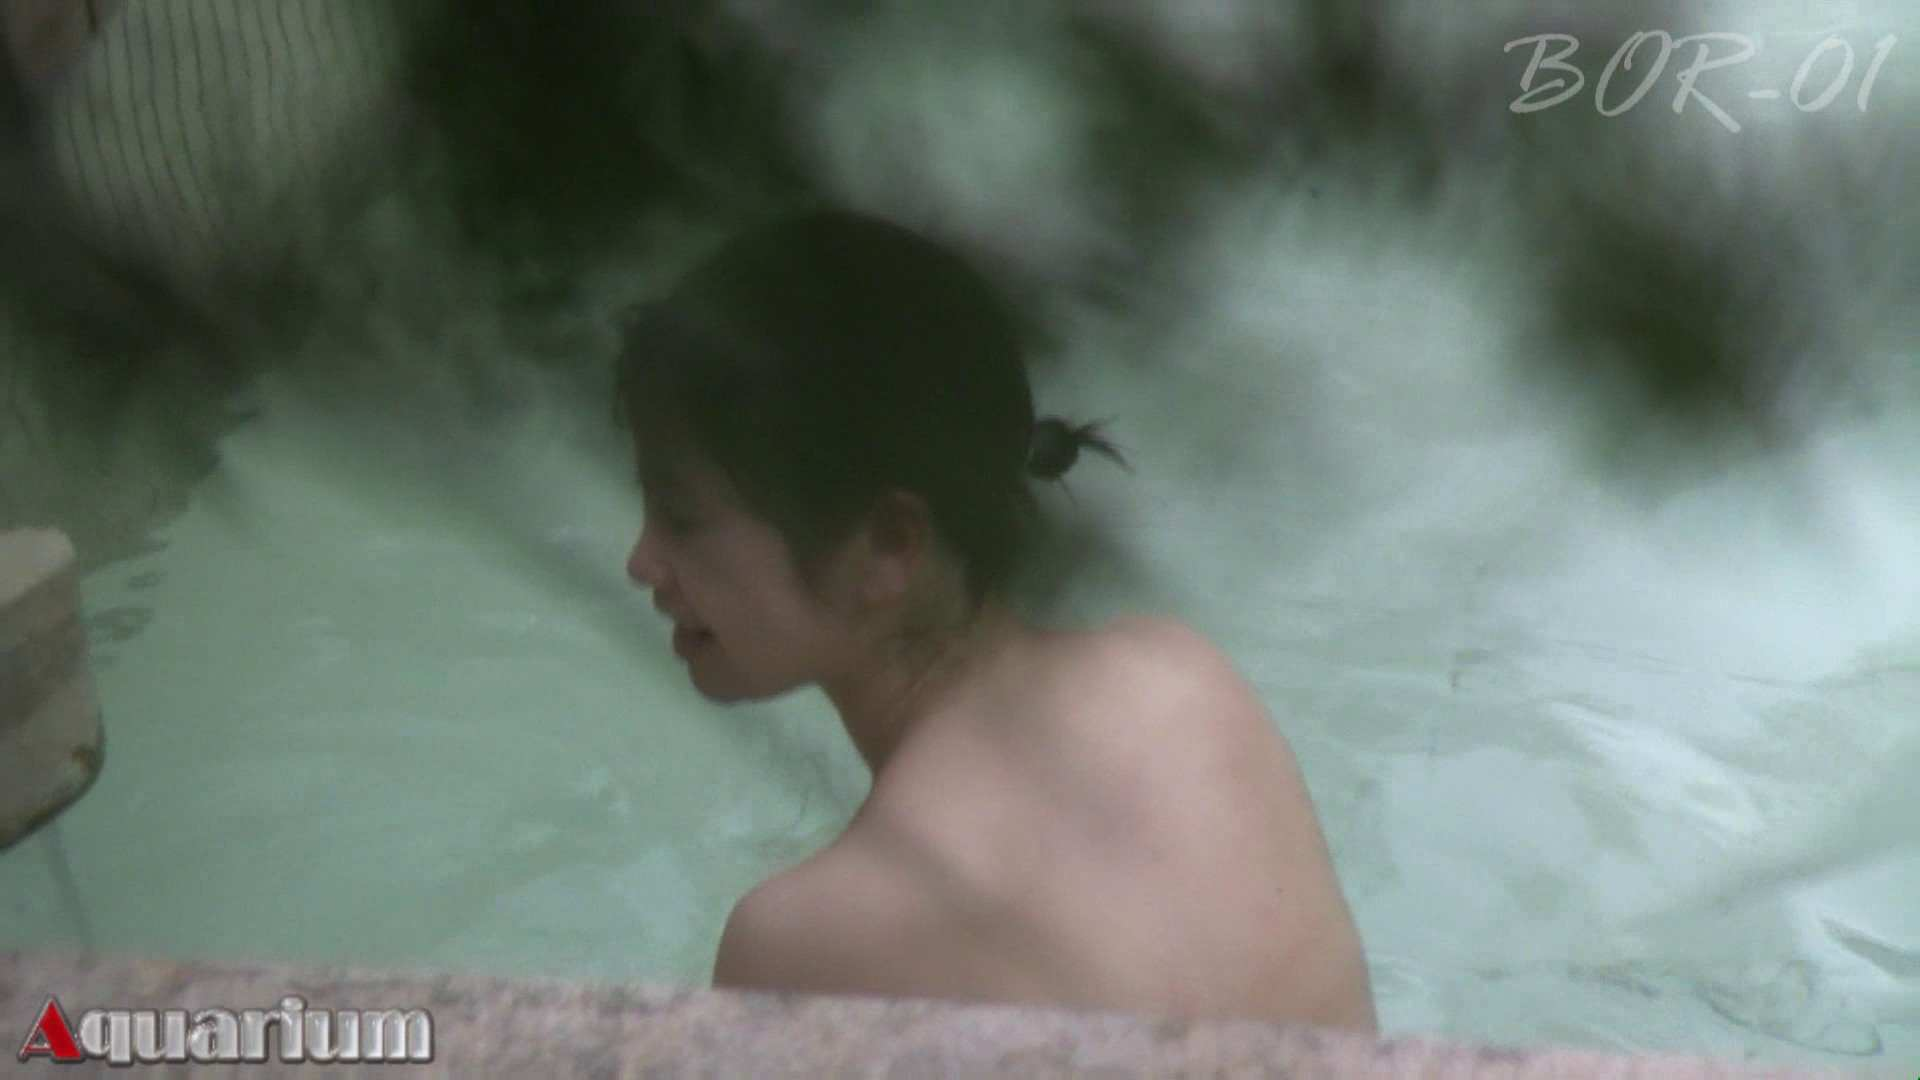 Aquaな露天風呂Vol.465 美しいOLの裸体 おめこ無修正動画無料 103pic 77